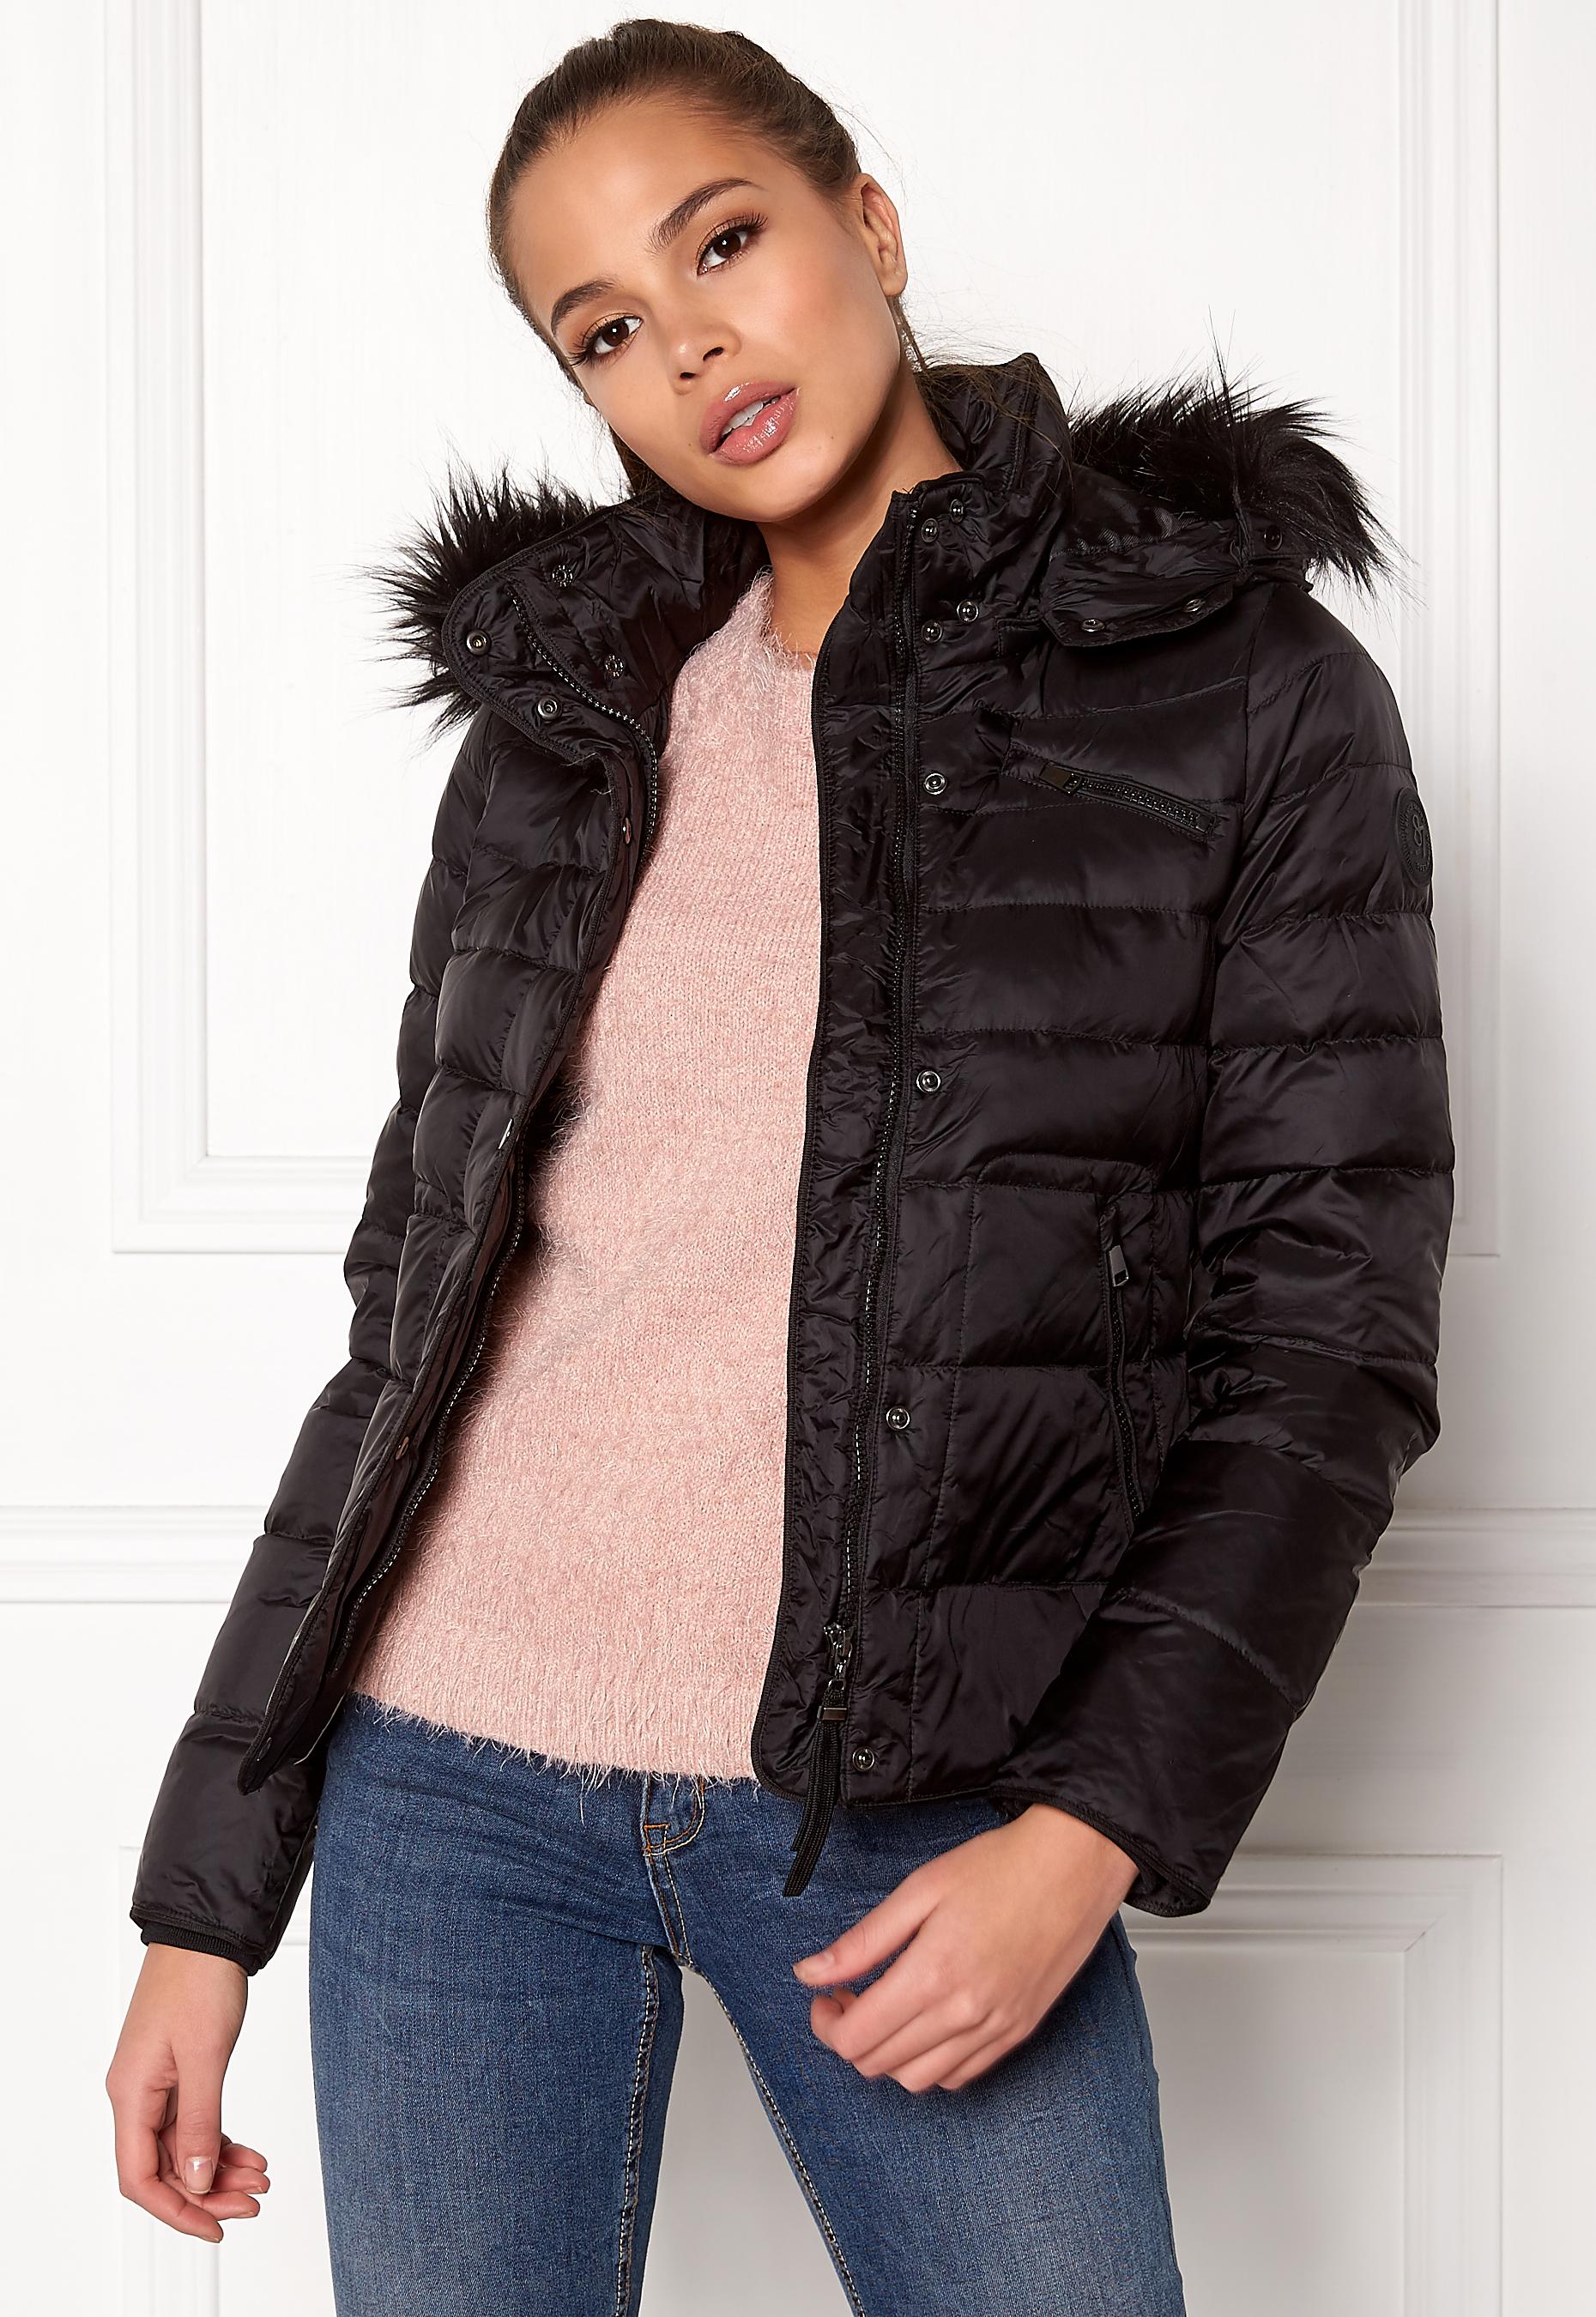 VERO MODA Marga Short Down Jacket Black Beauty - Bubbleroom